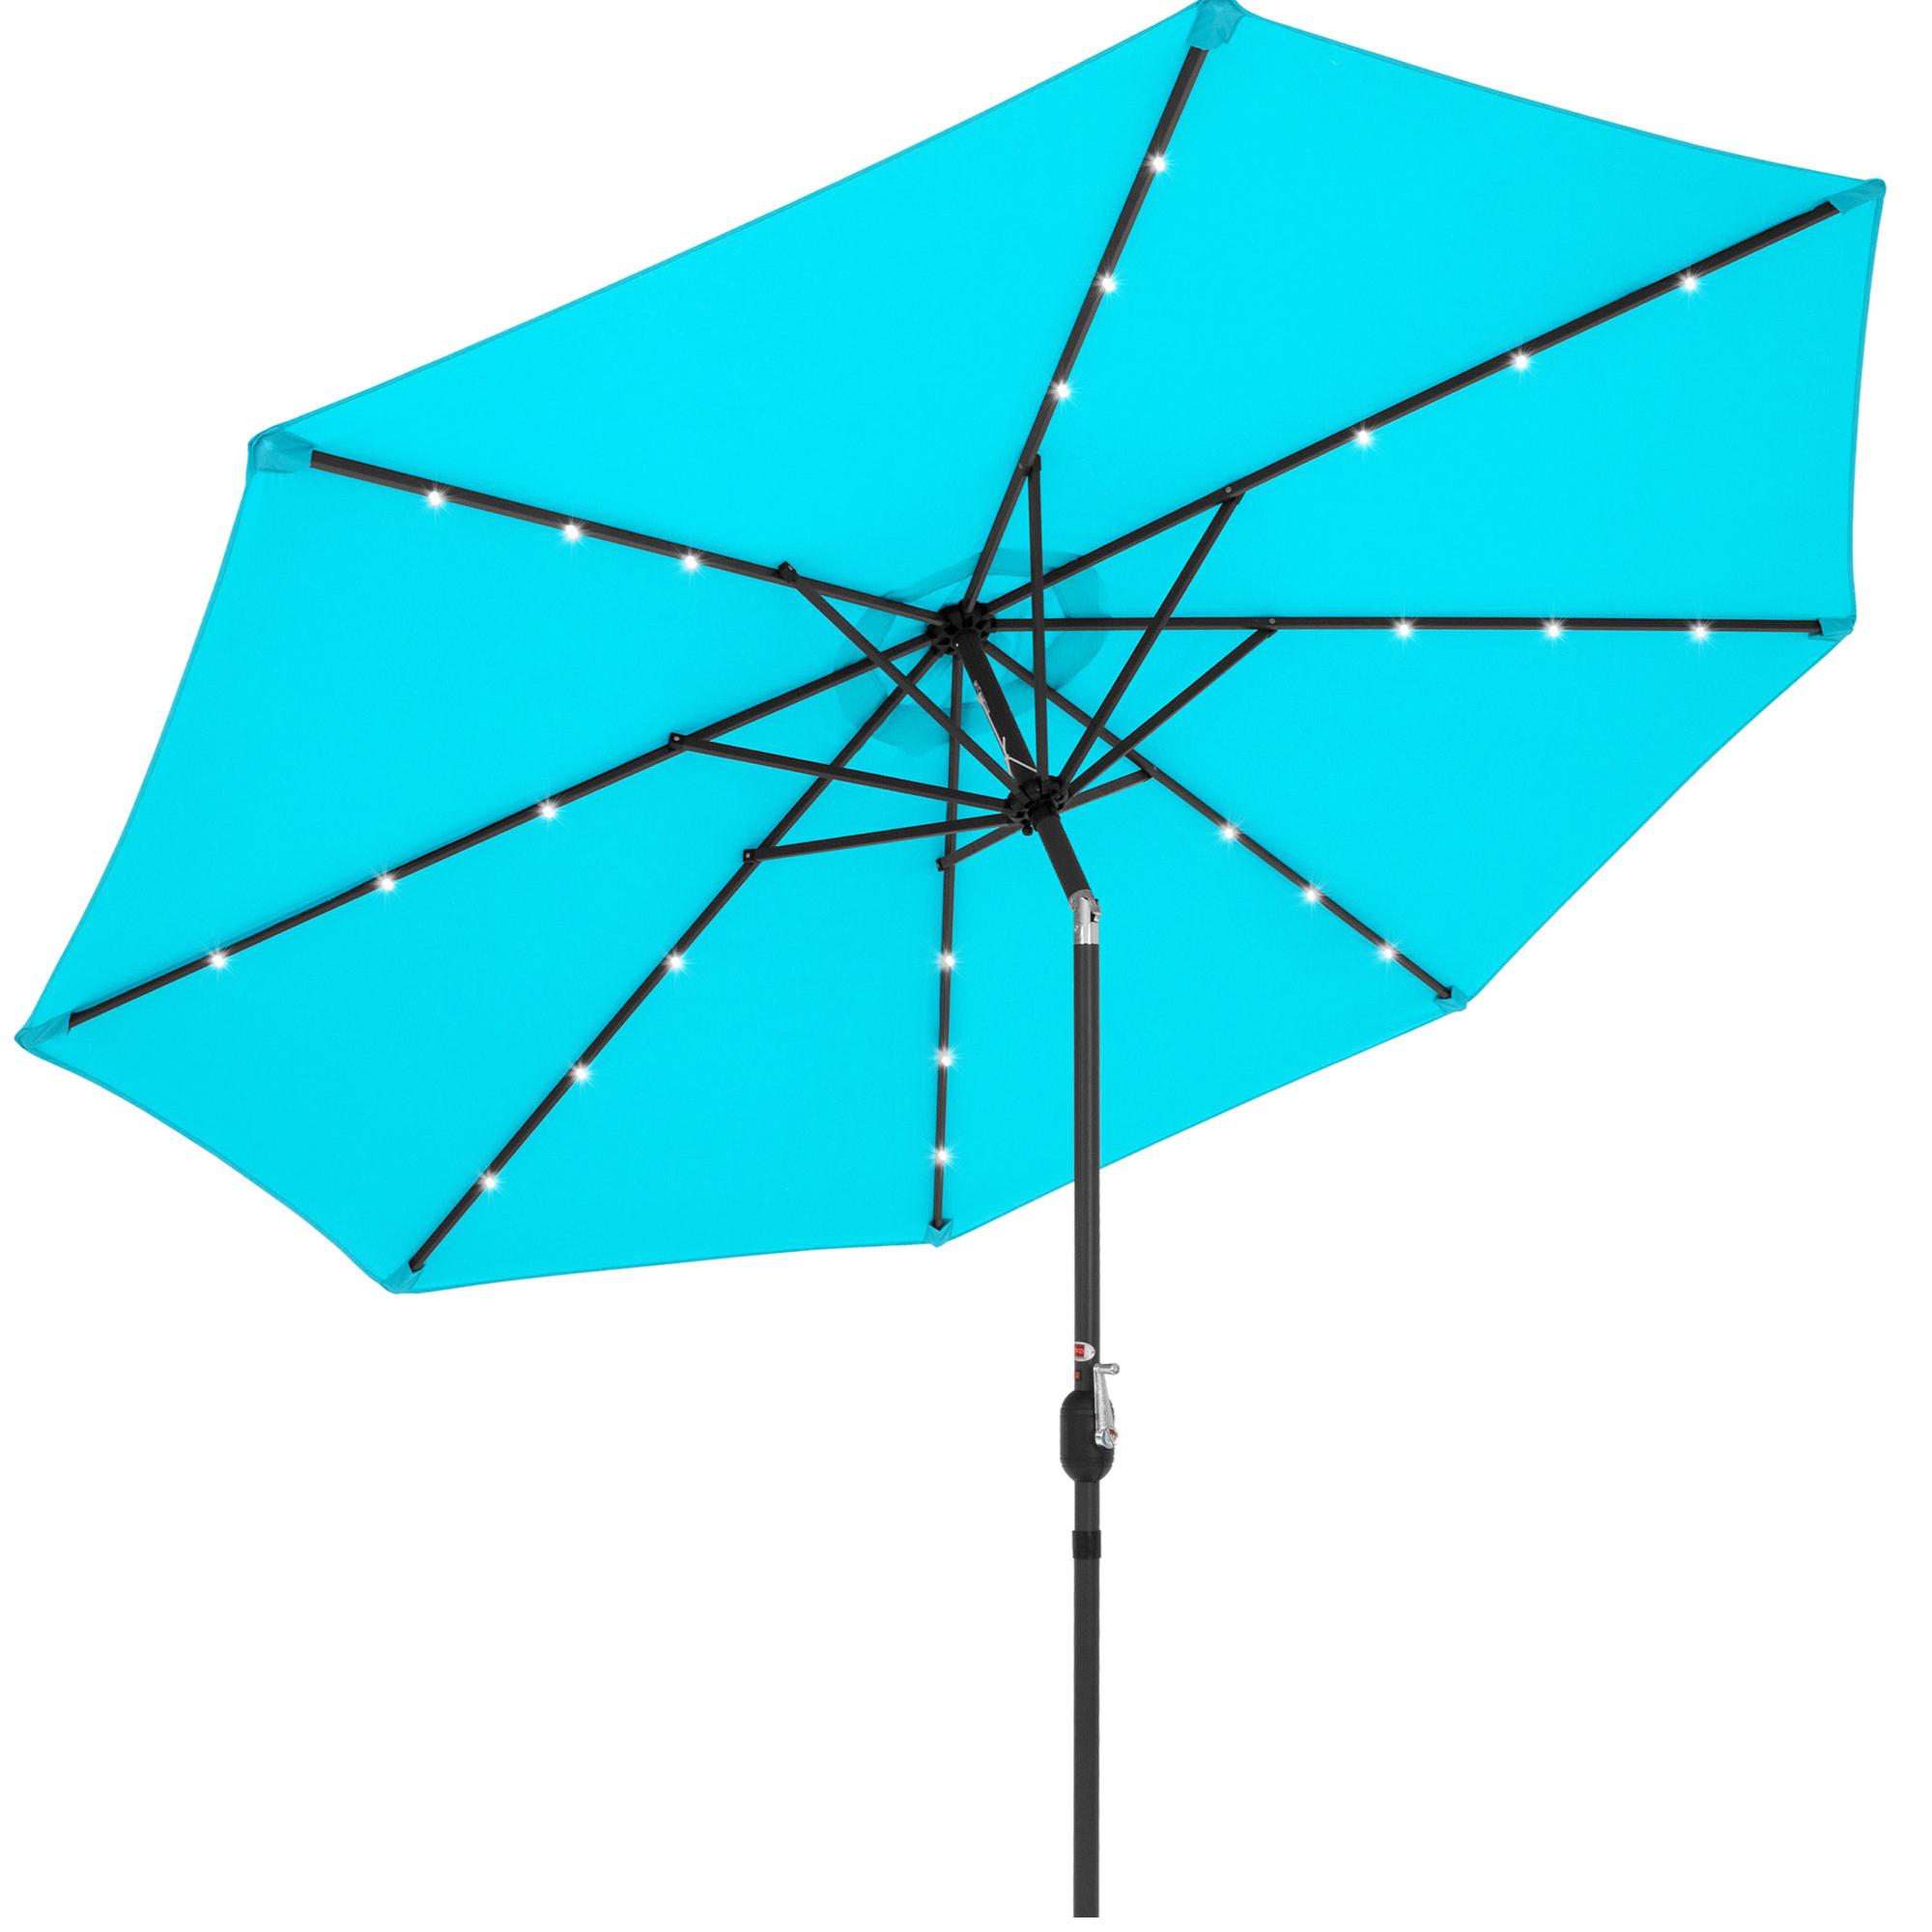 best choice products 10ft solar led lighted patio umbrella w tilt adjustment fade resistant fabric light blue